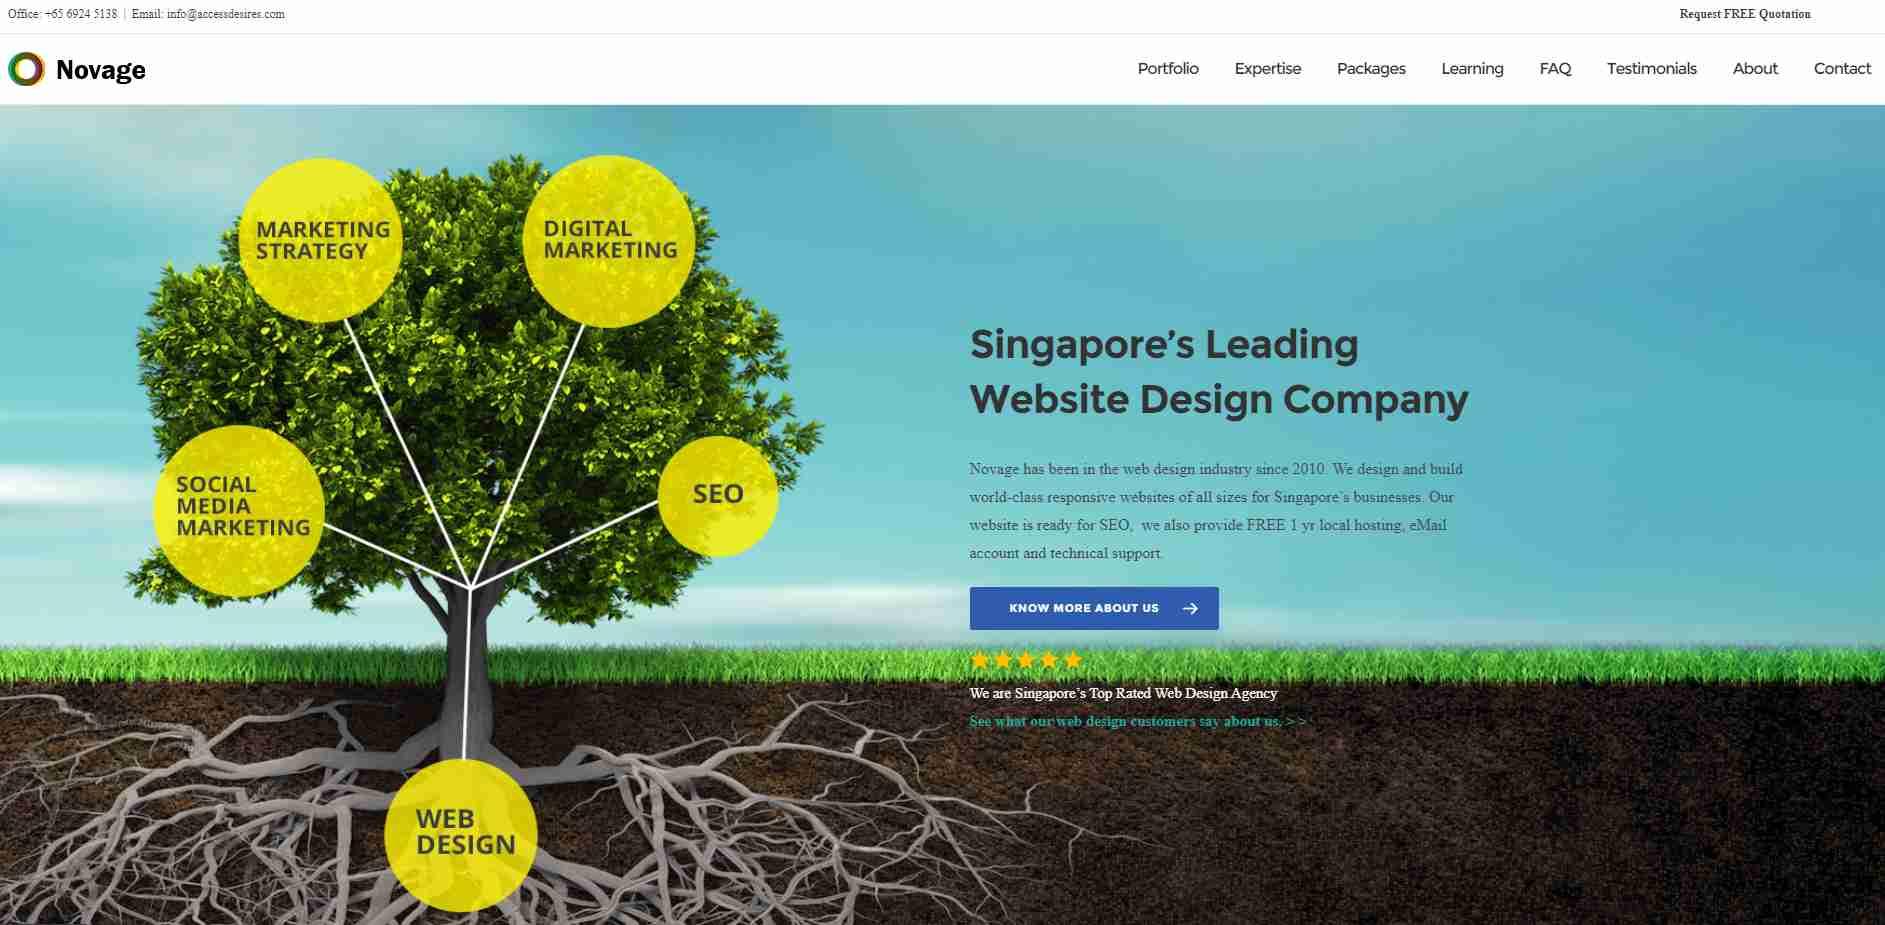 novage Website Copywriting The Complete Guide